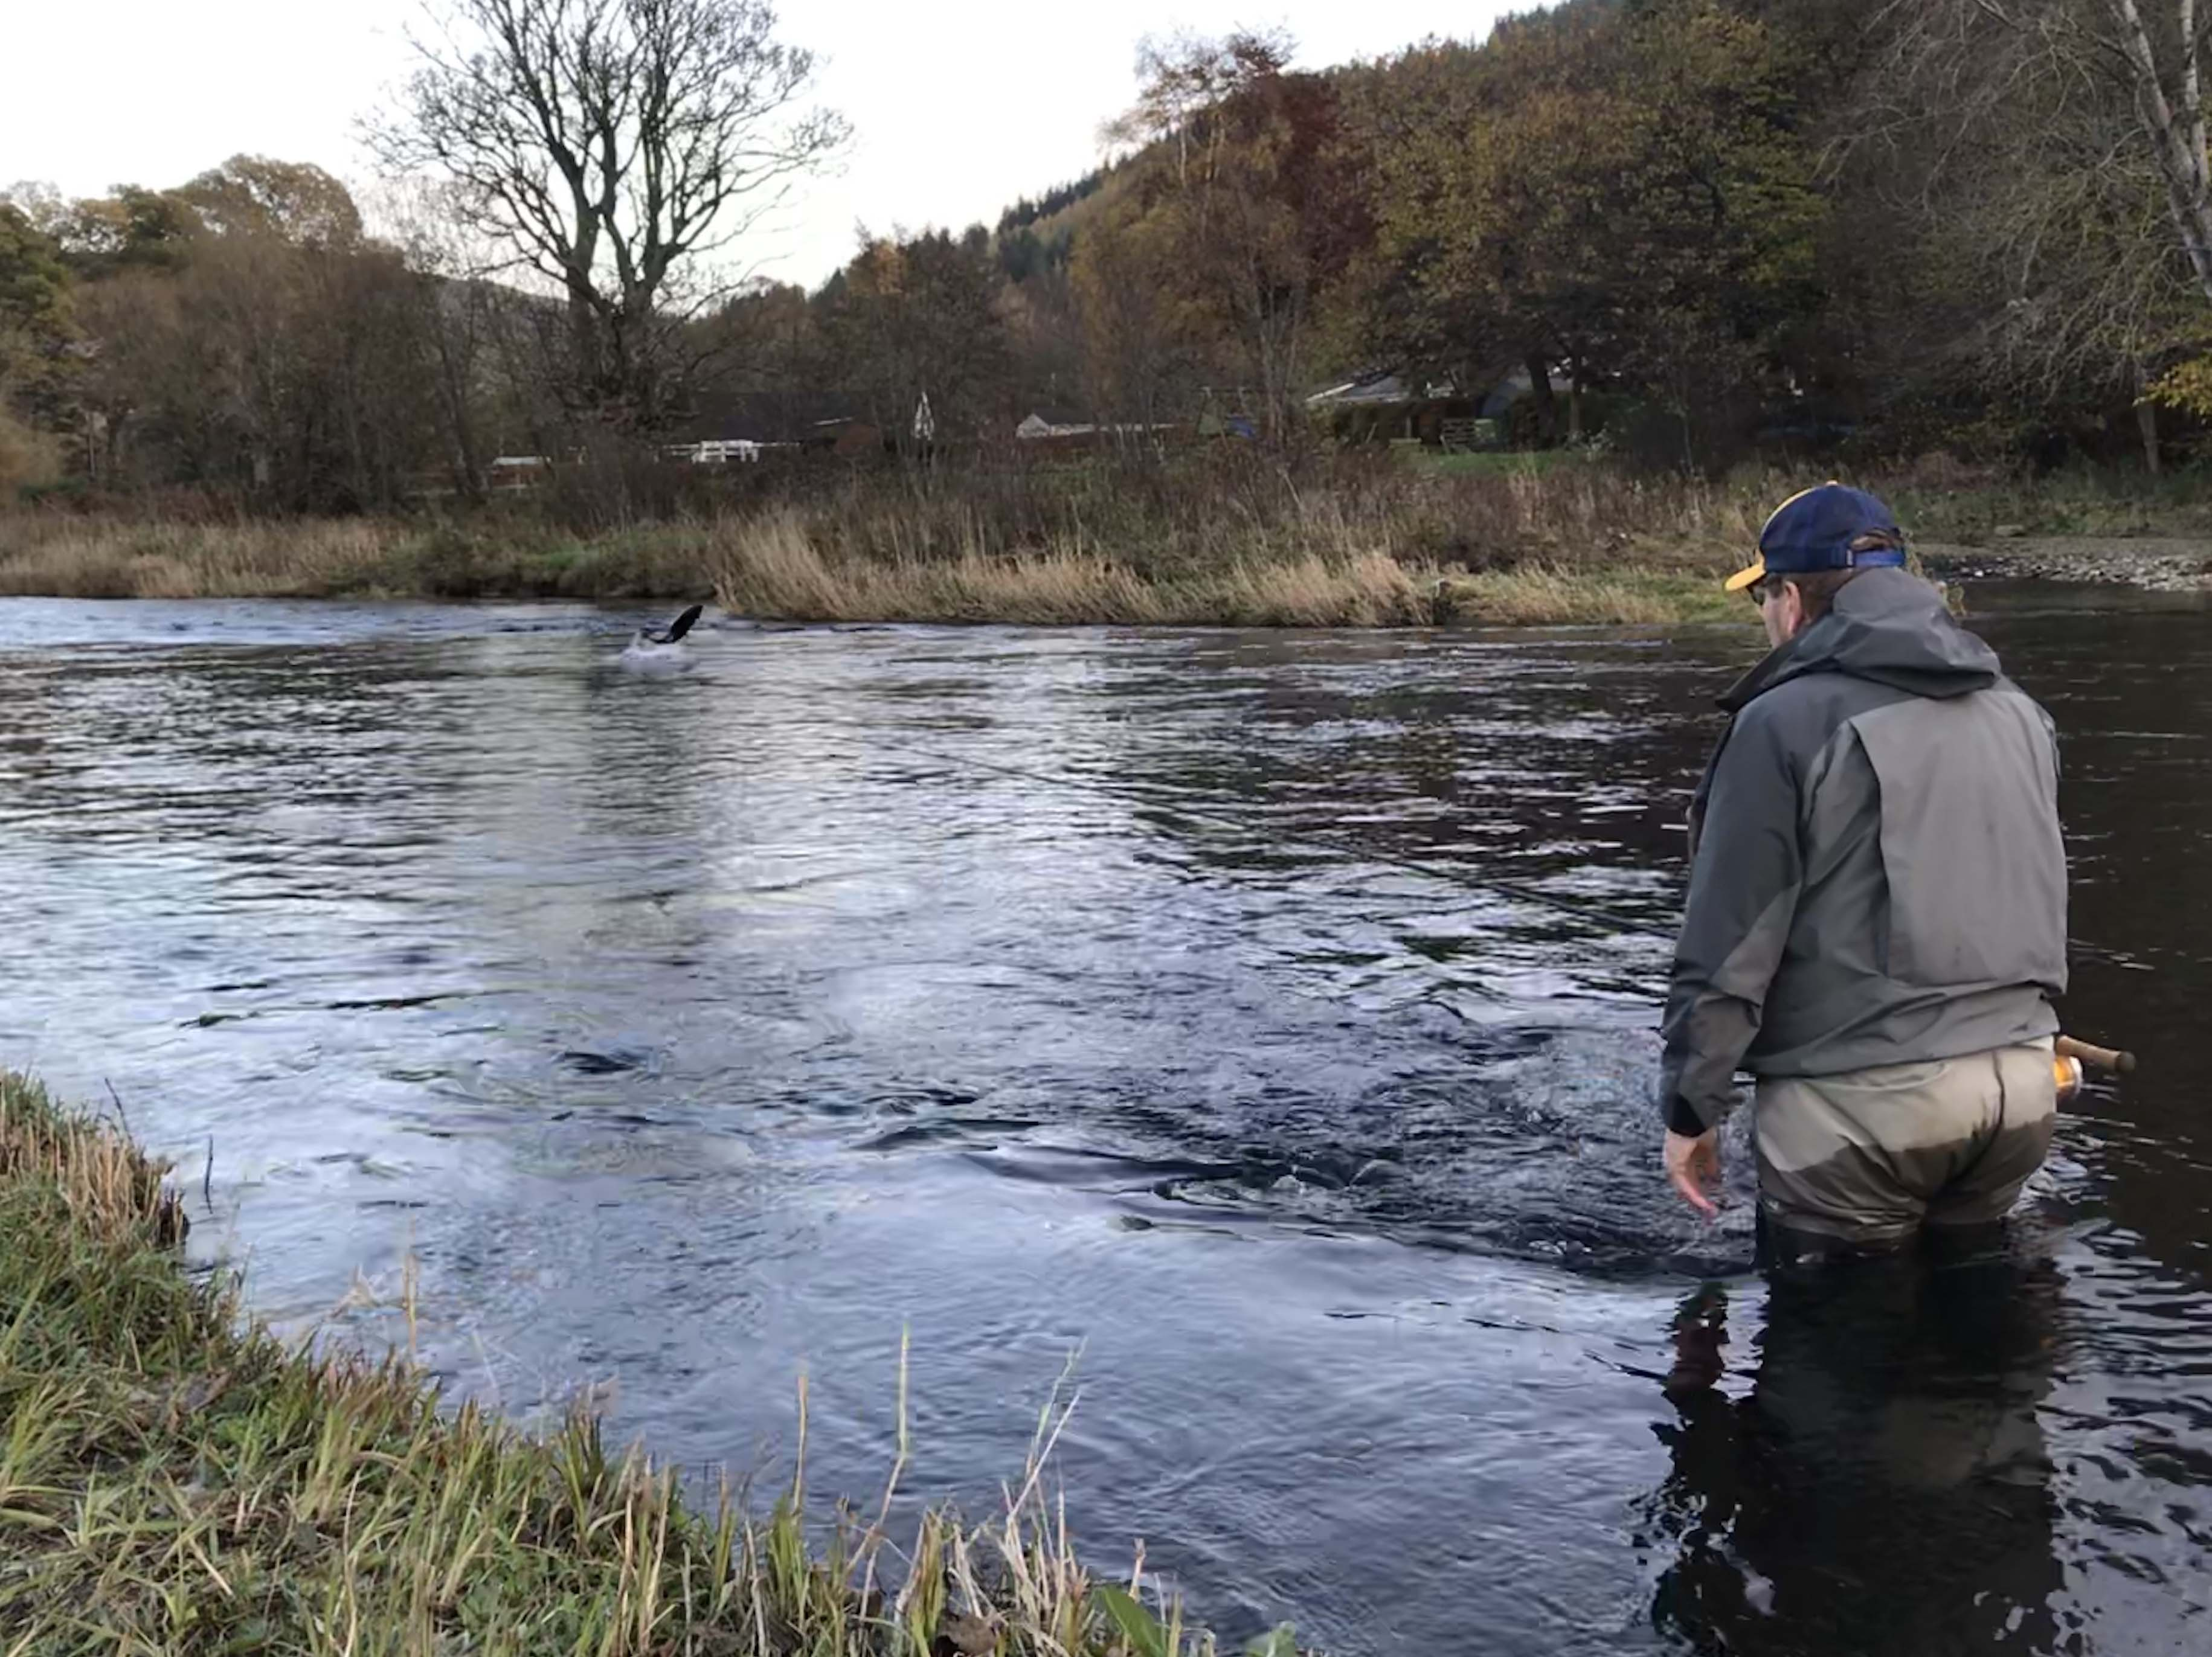 skotlanti scotland skottland tweed tweedjoki perhokalastus flyfishing flugfiske lohi salmon lax Fishmaster kalastus perhokalastusmatka kalastusmatka